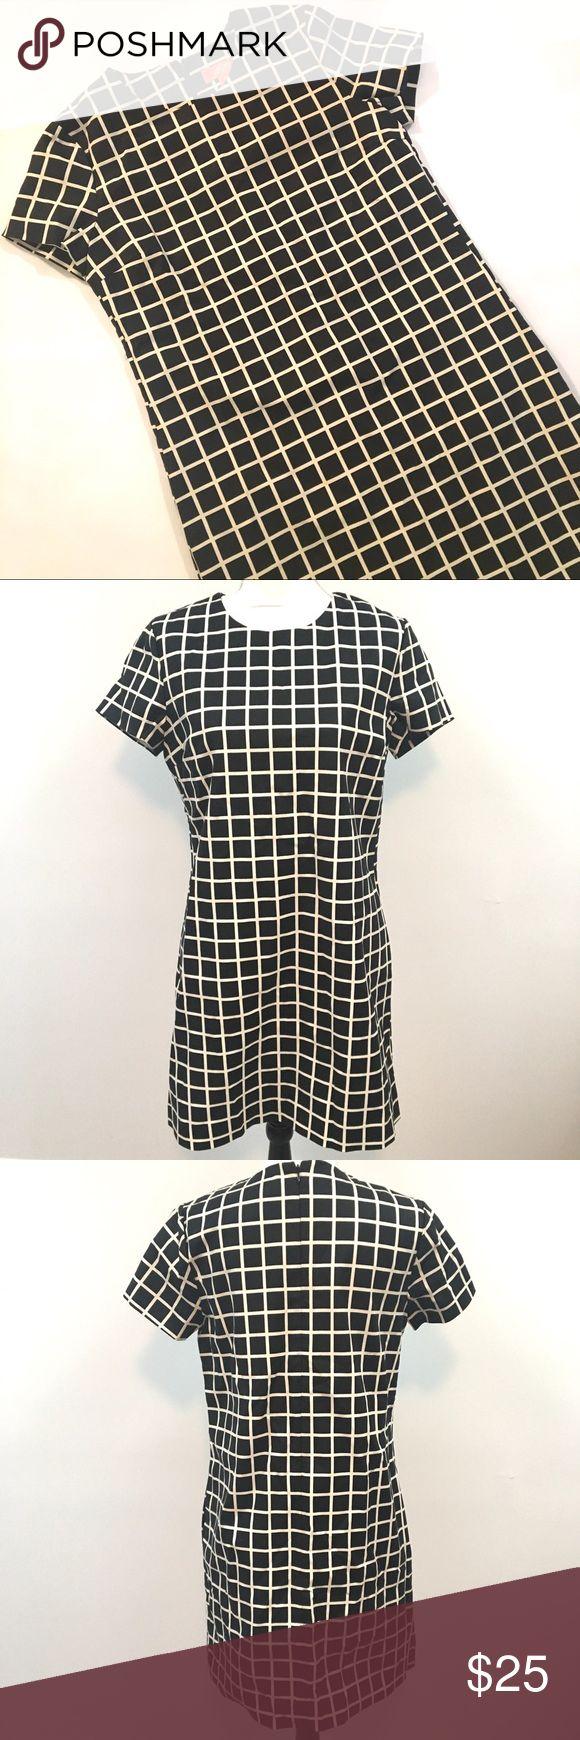 Joe Fresh Mod Grid Black and Cream Dress Size Med Joe Fresh Mod Grid Black and Cream Dress Size Medium Joe Fresh Dresses